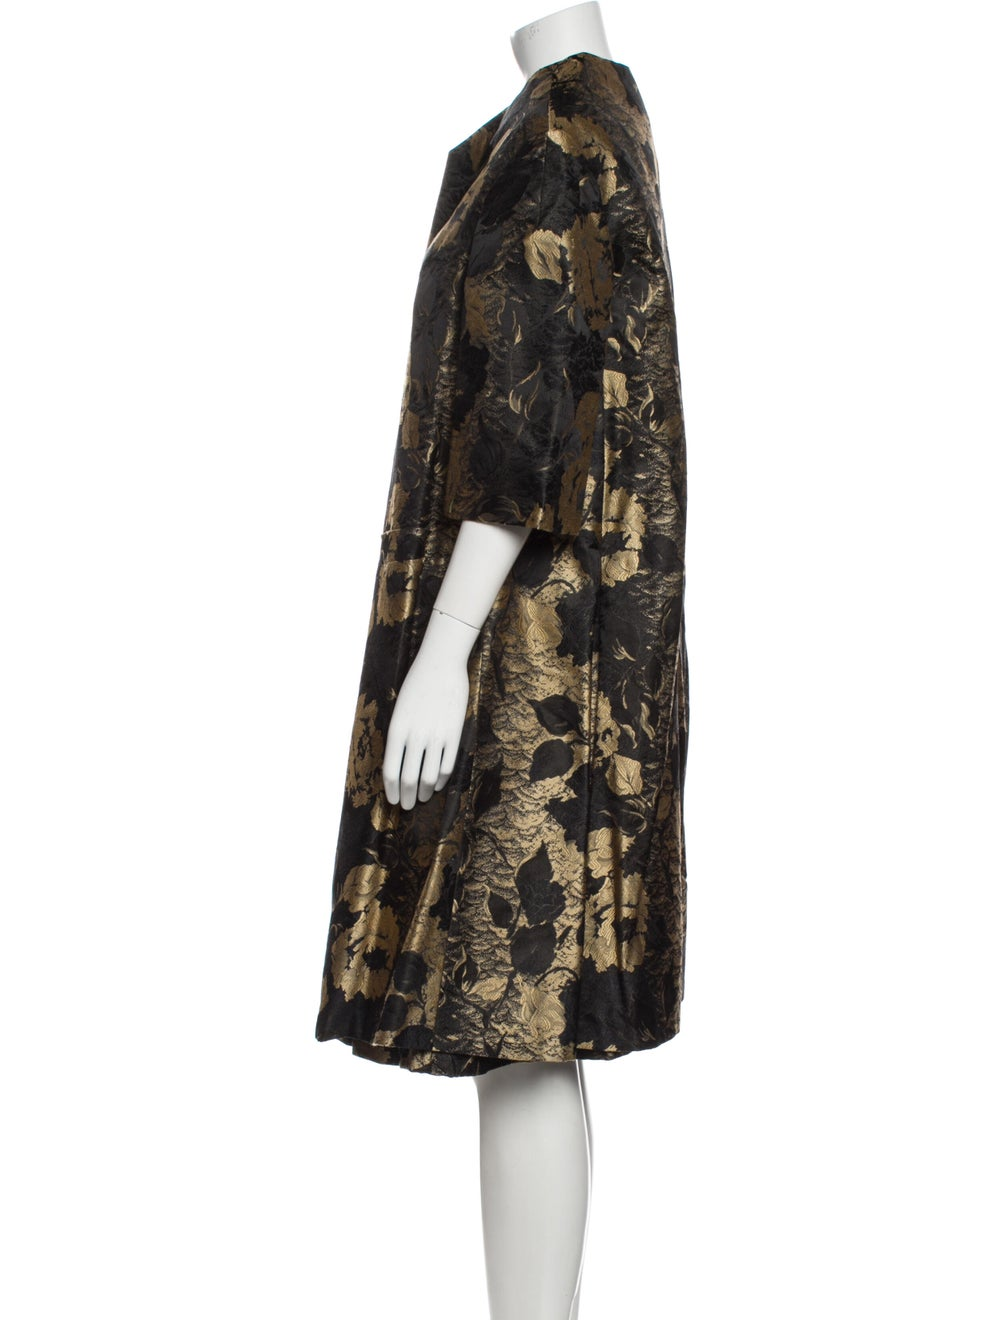 Arnold Scaasi Vintage Knee-Length Dress Black - image 2